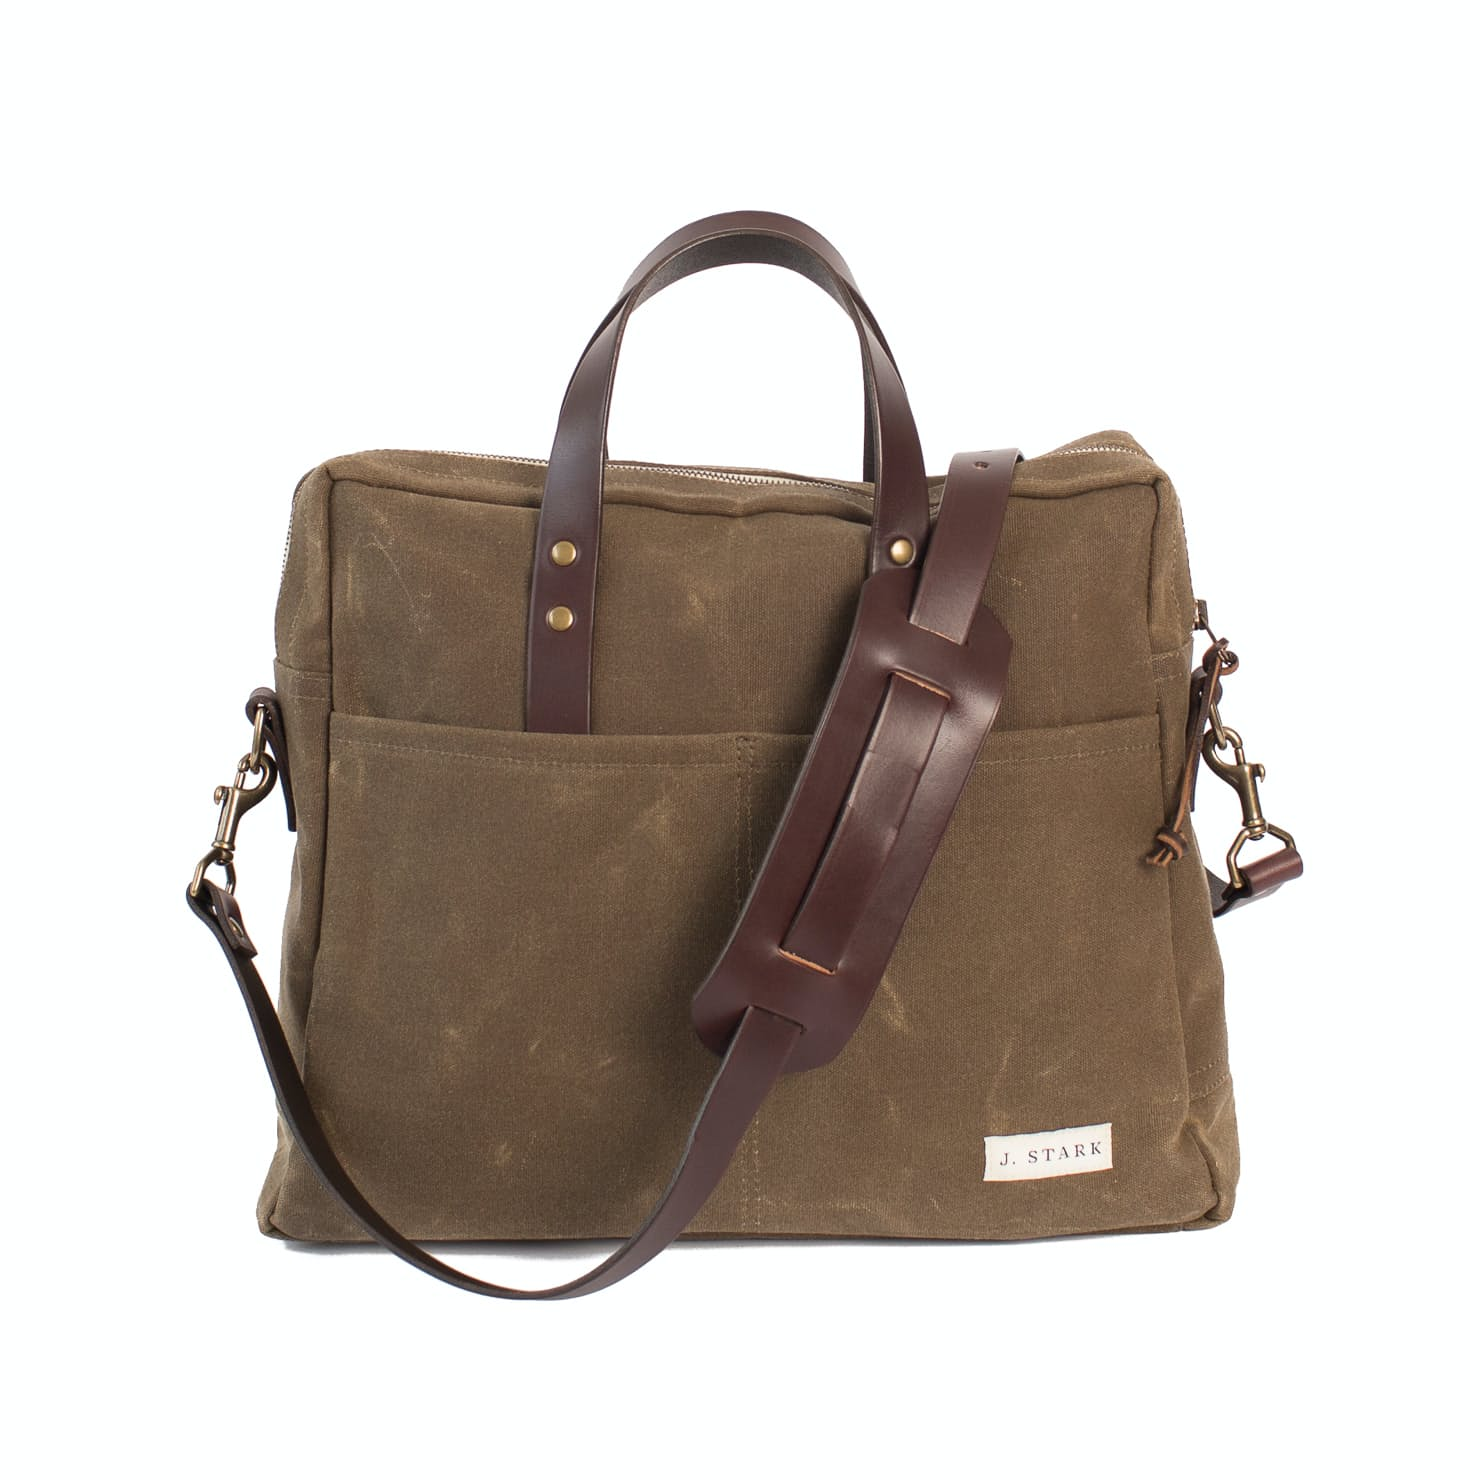 To54jntluq j stark prospect briefcase 0 original